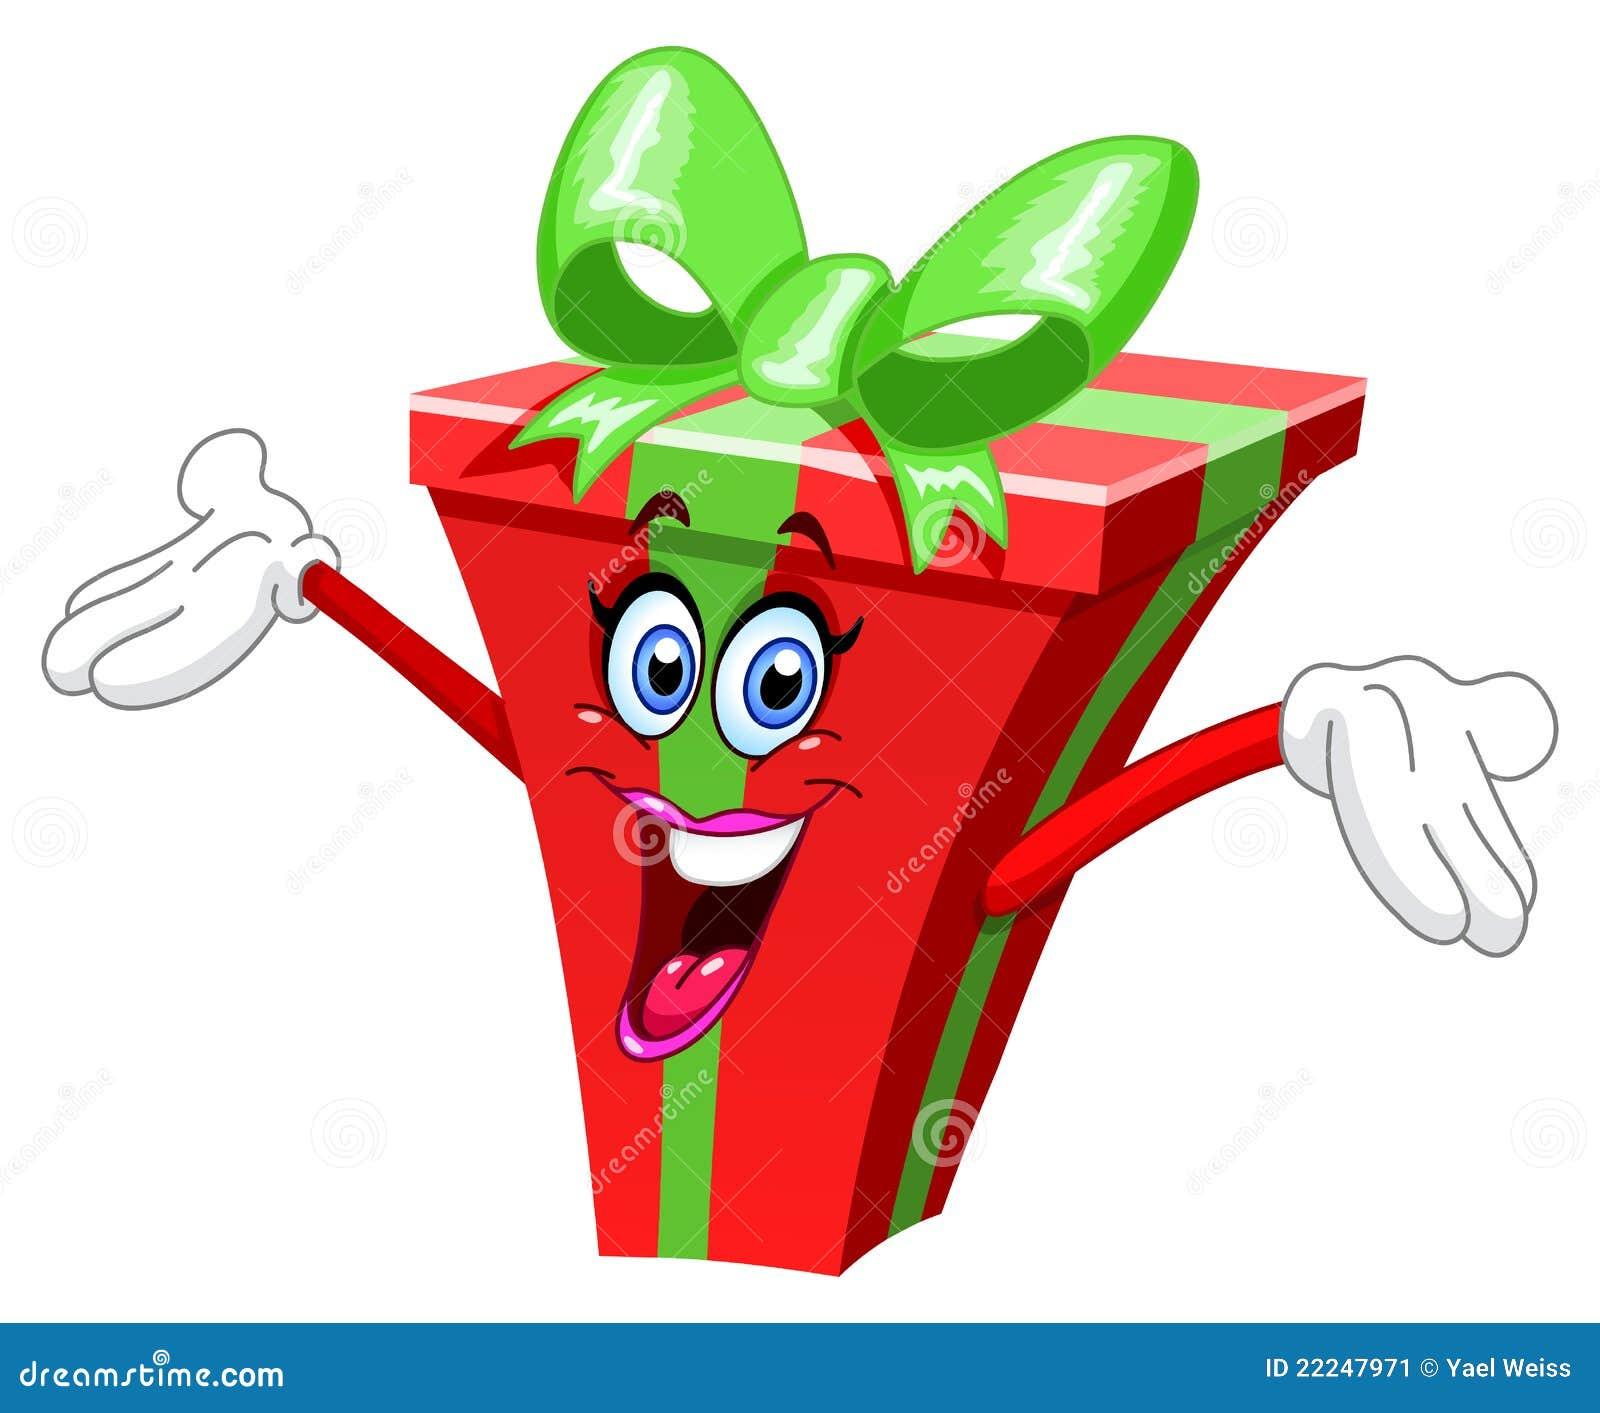 Подарить подарок шутливо